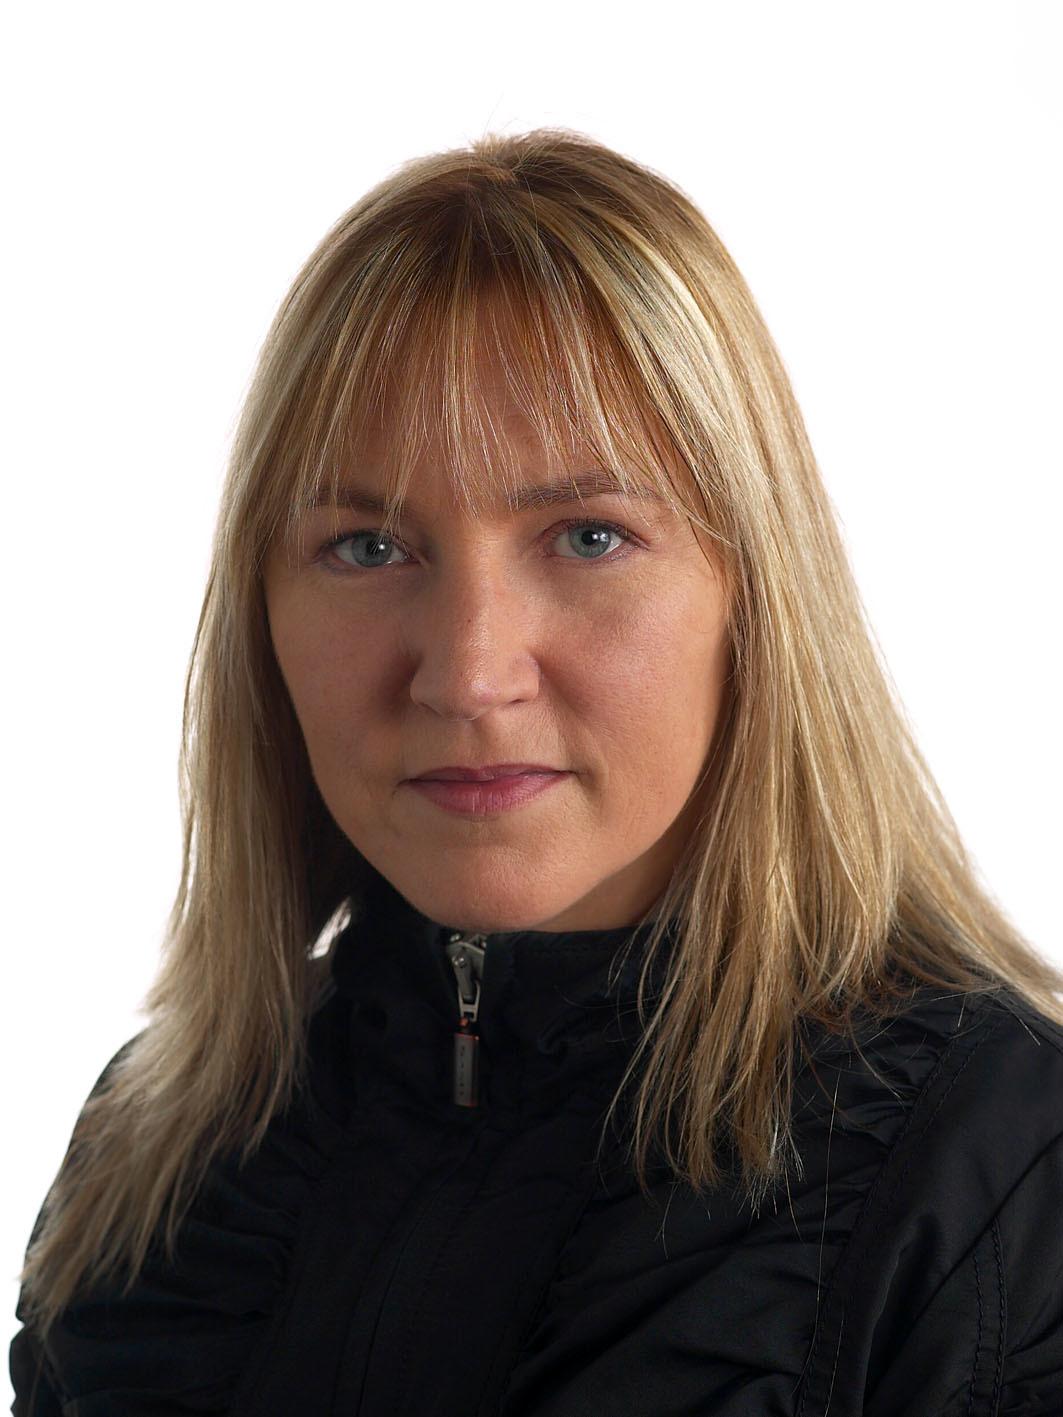 Guðrún Öyahals